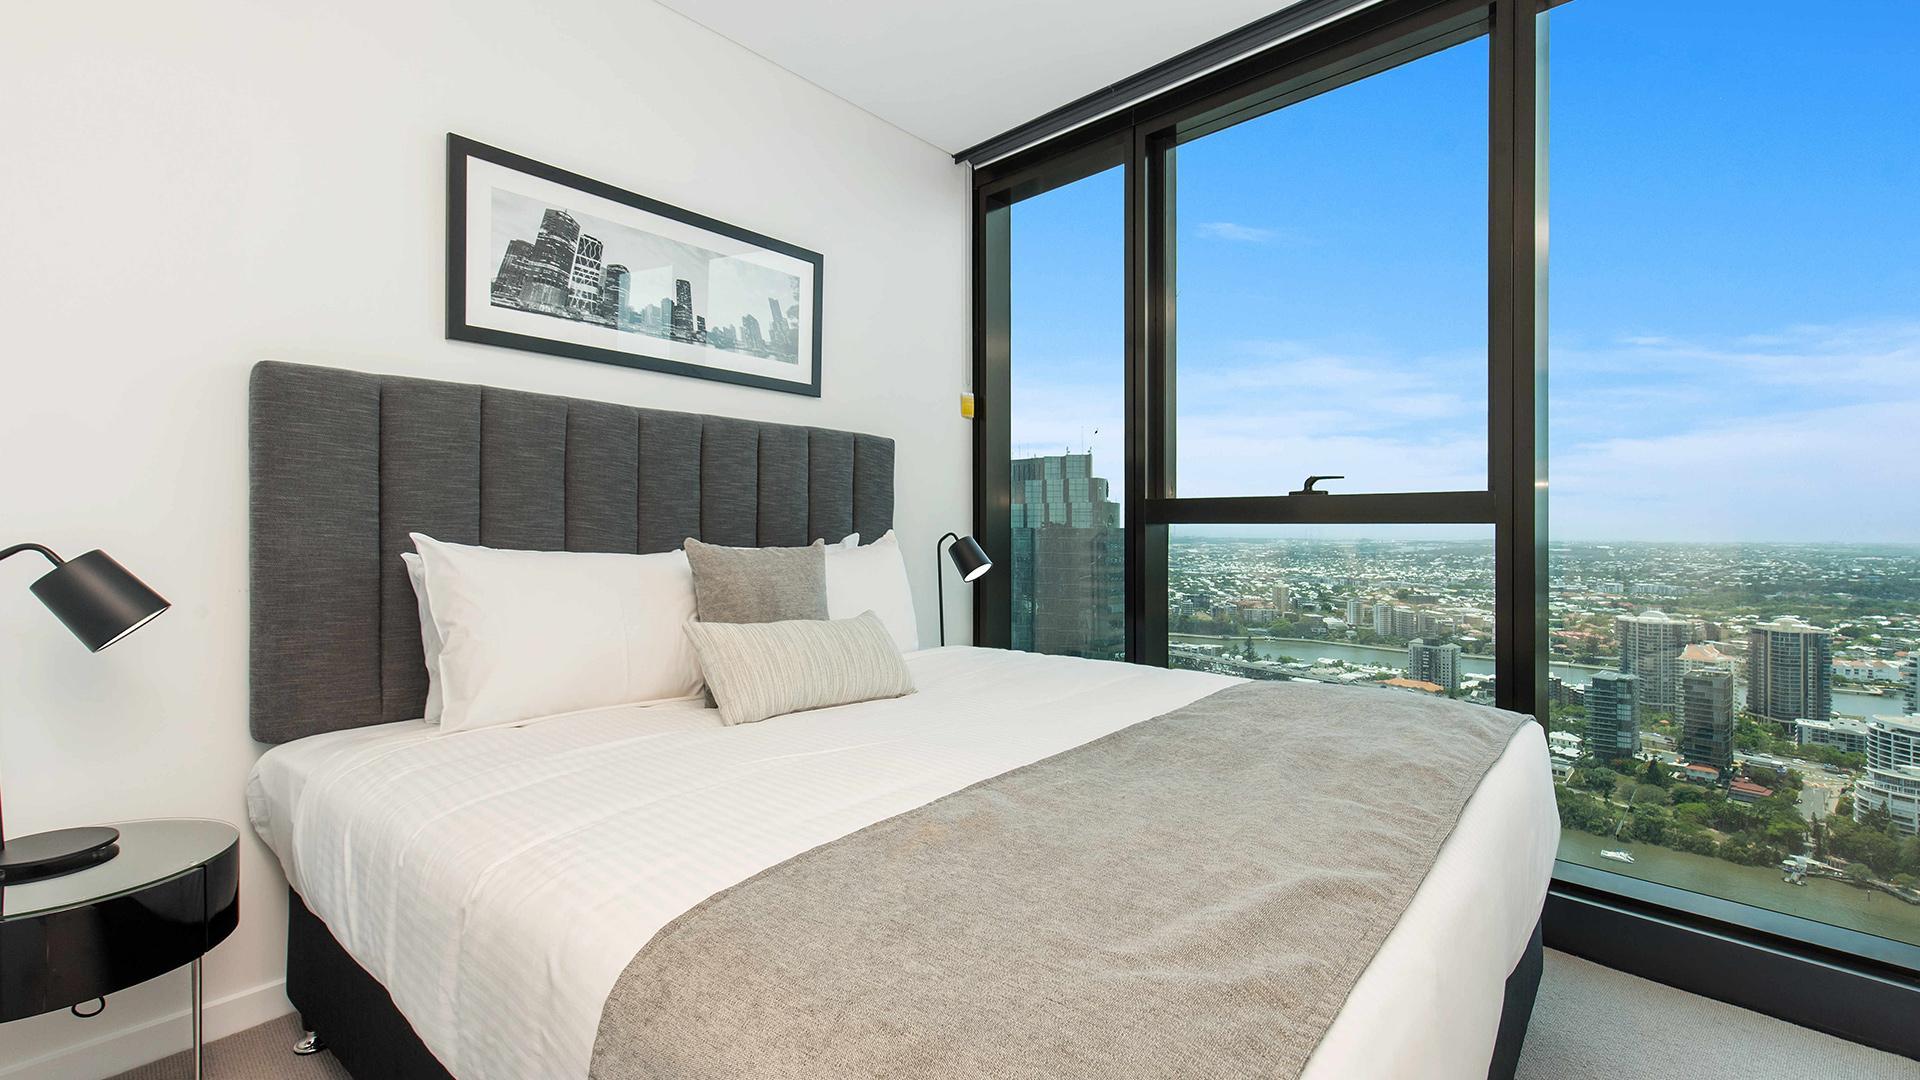 One-Bedroom Sky High Apartment   image 1 at Arise Brisbane Skytower by Brisbane City, Queensland, Australia